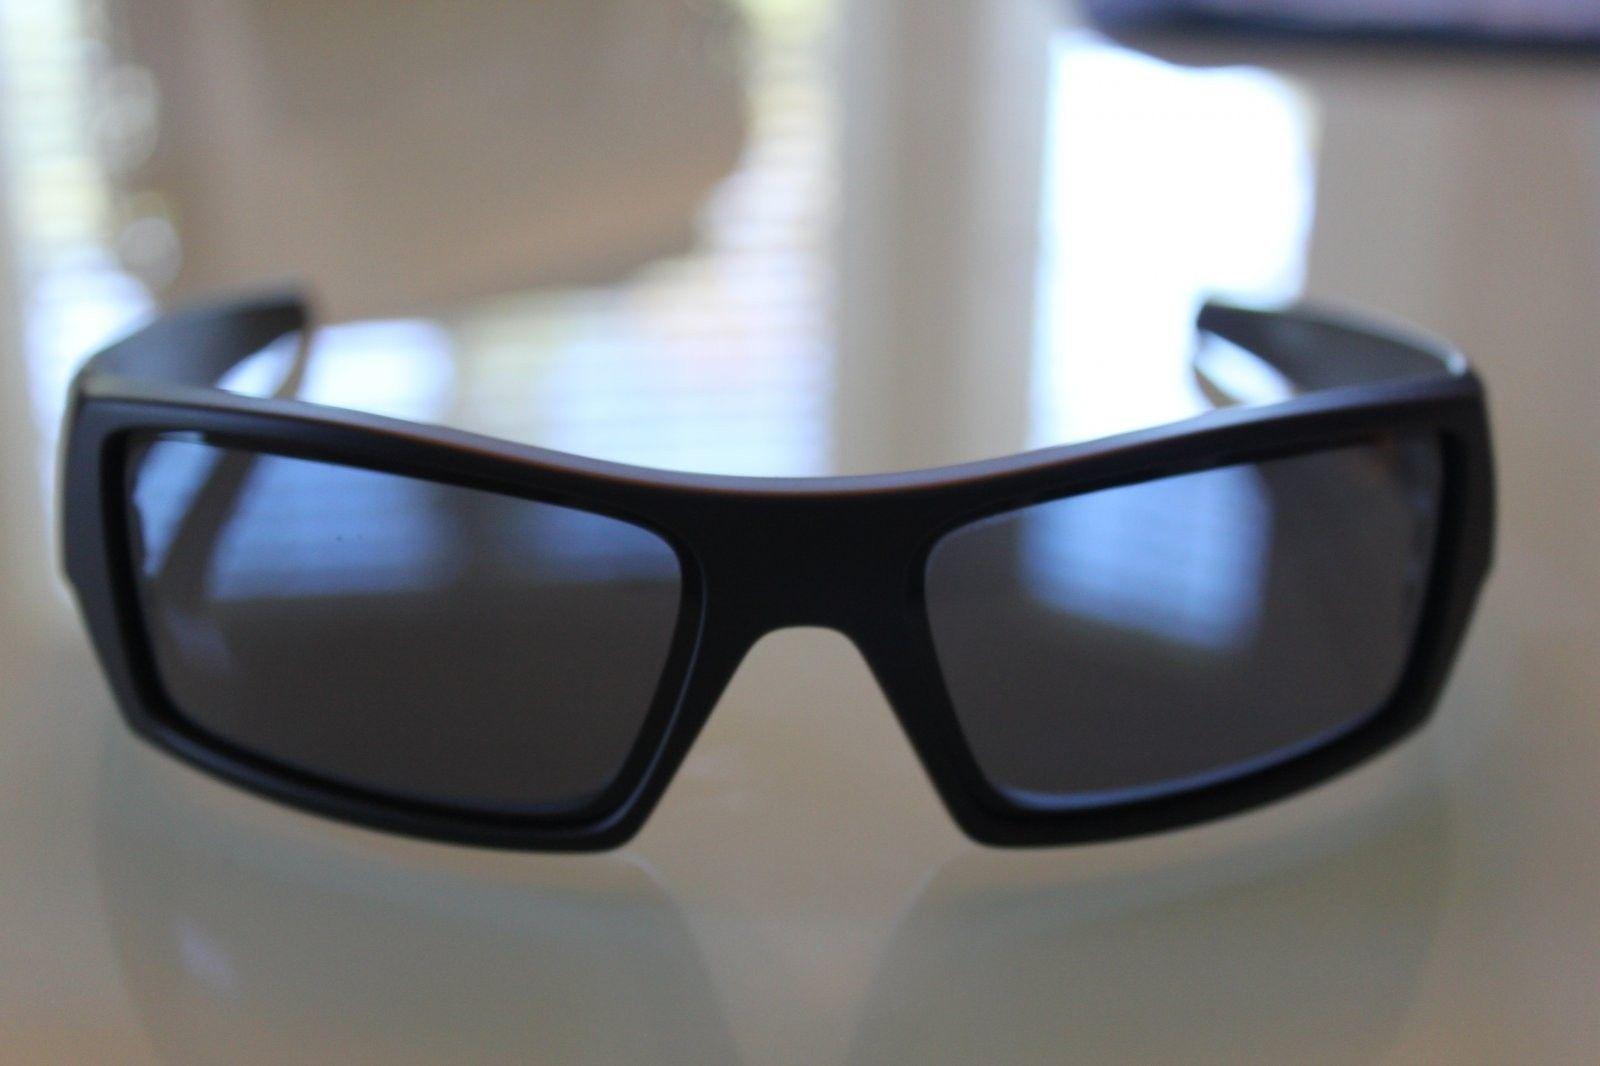 Matte Black Gascan With Grey Lens - IMG_5593.JPG